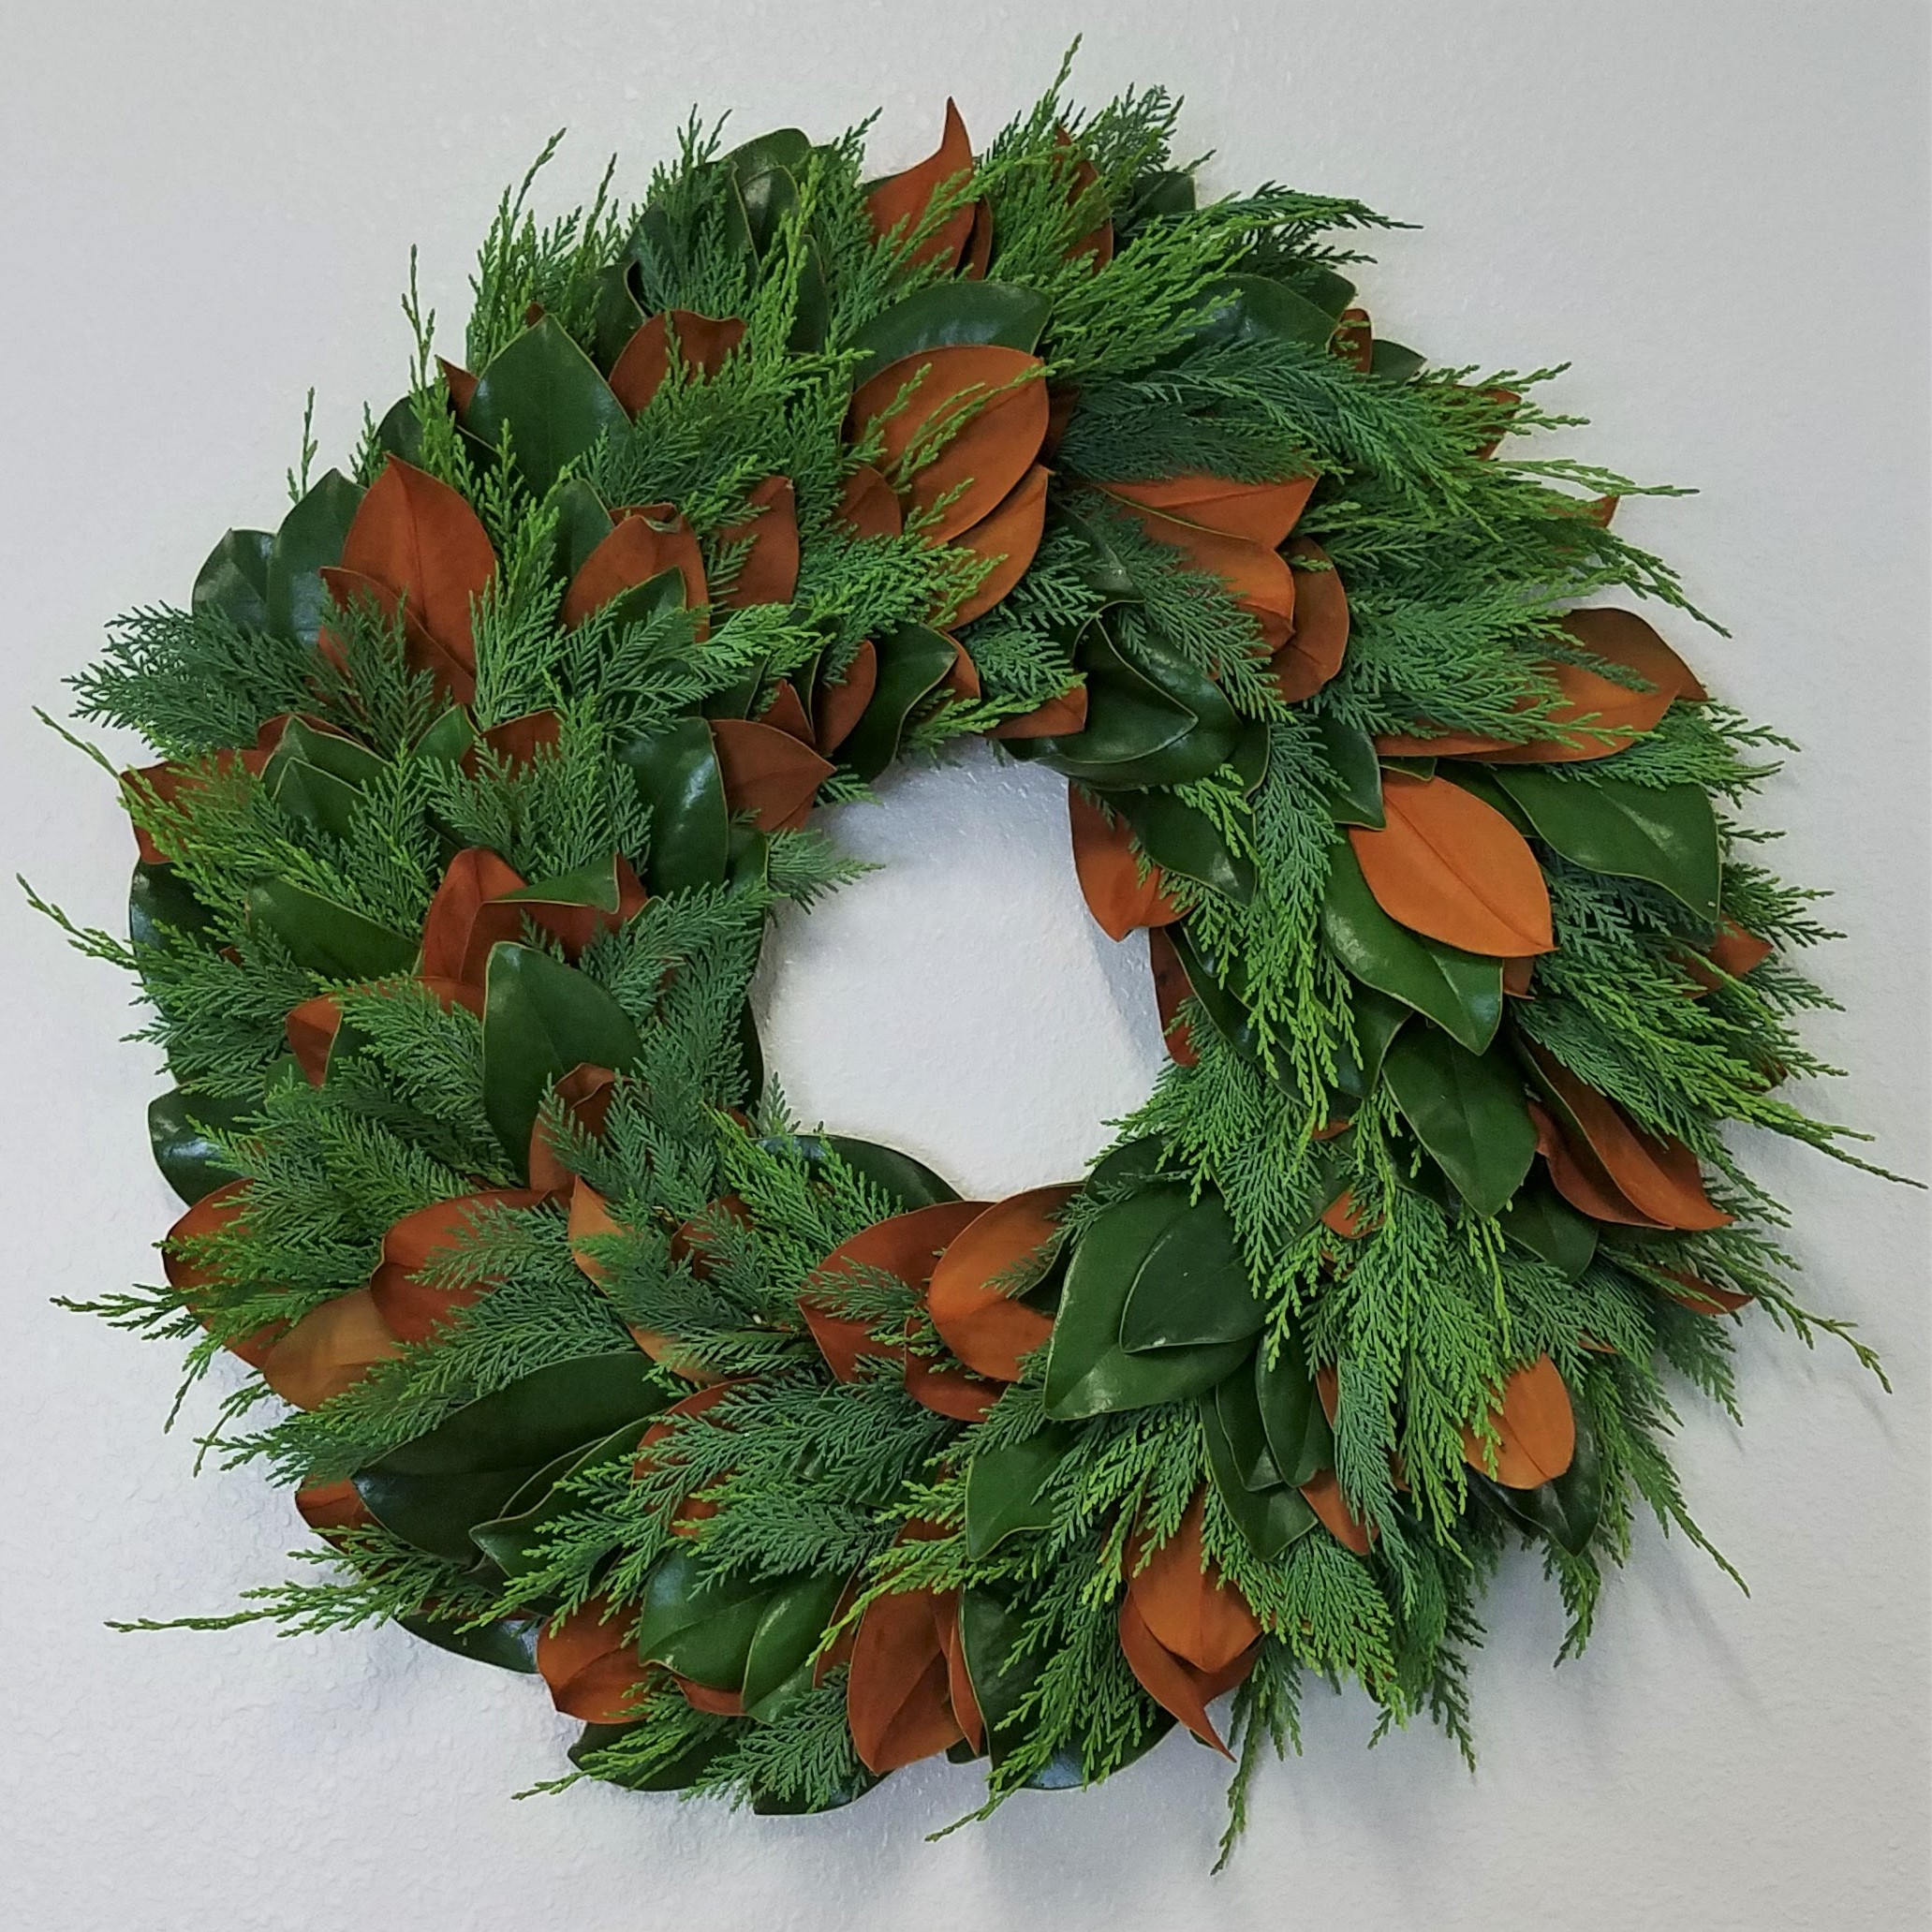 Magnolia /& Evergreen Wreath